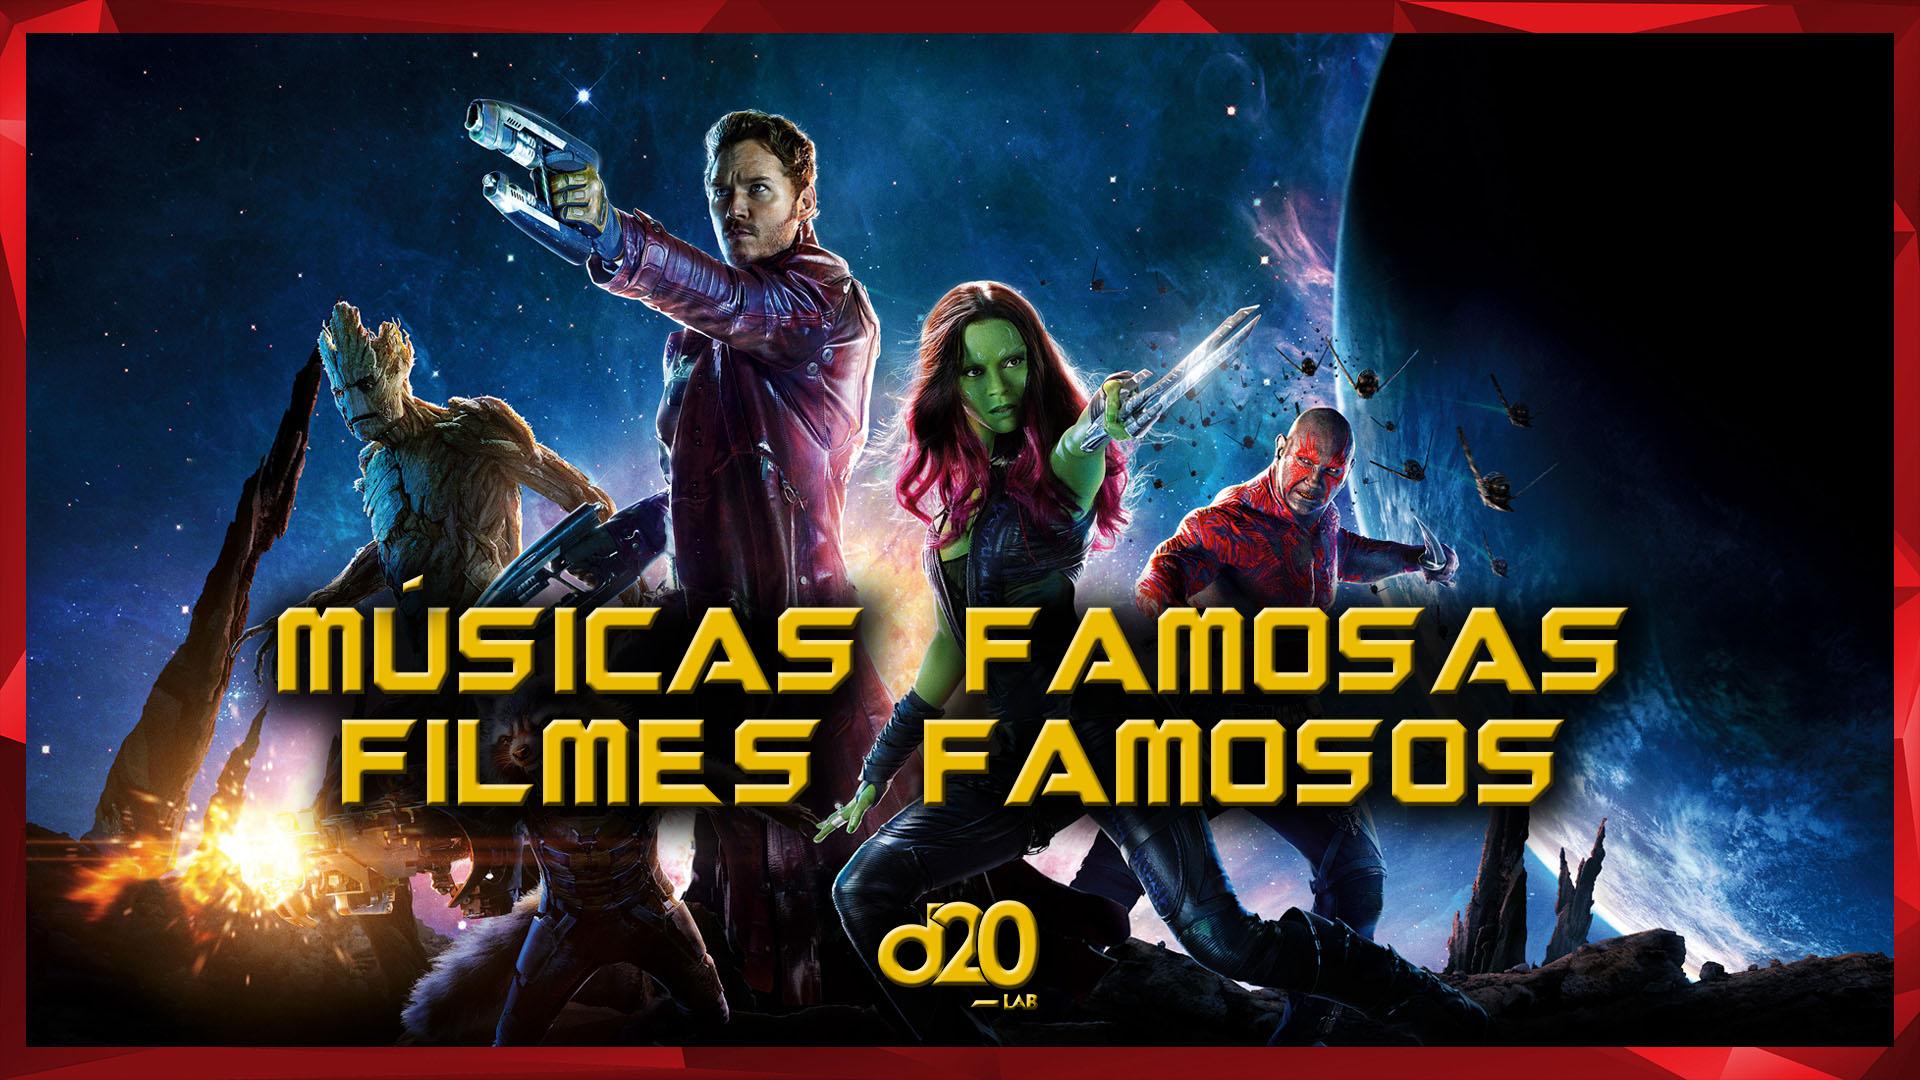 Músicas Famosas, Filmes Famosos | D20 Lab 51